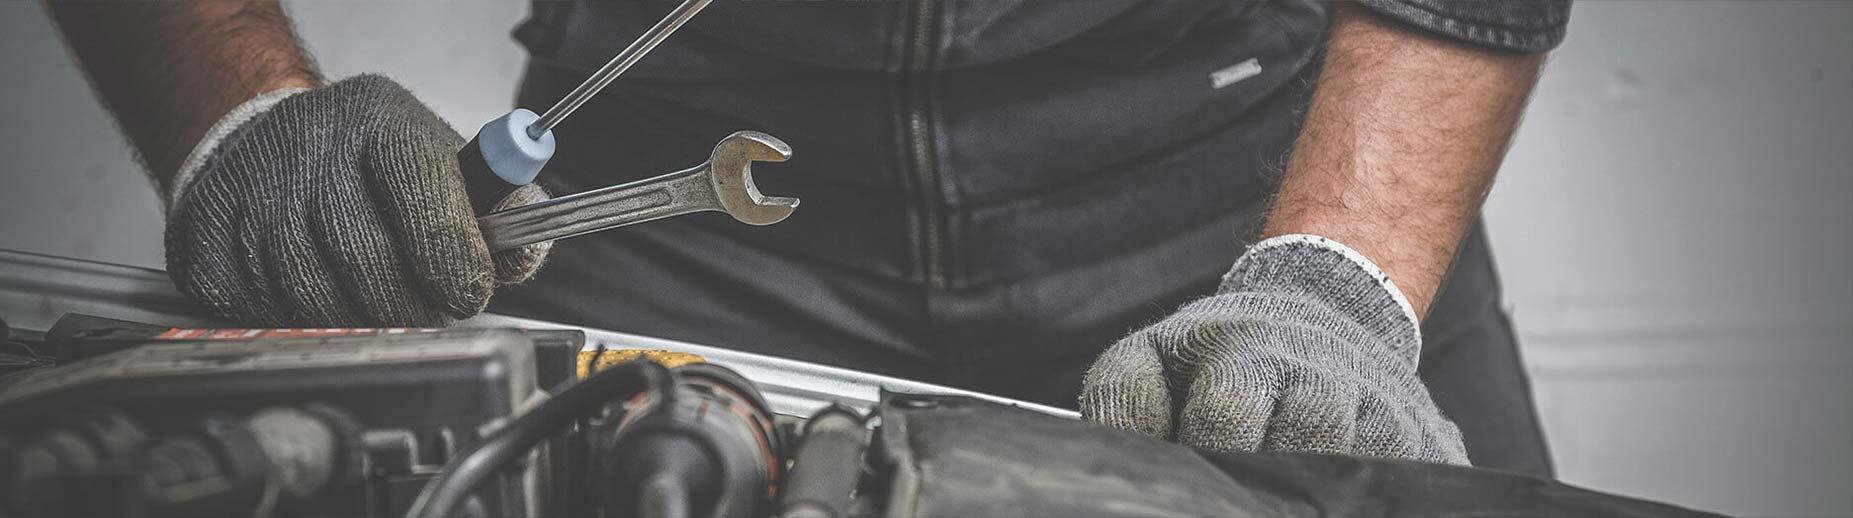 Lubbock Auto Repair, Auto Mechanic and Diesel Mechanic